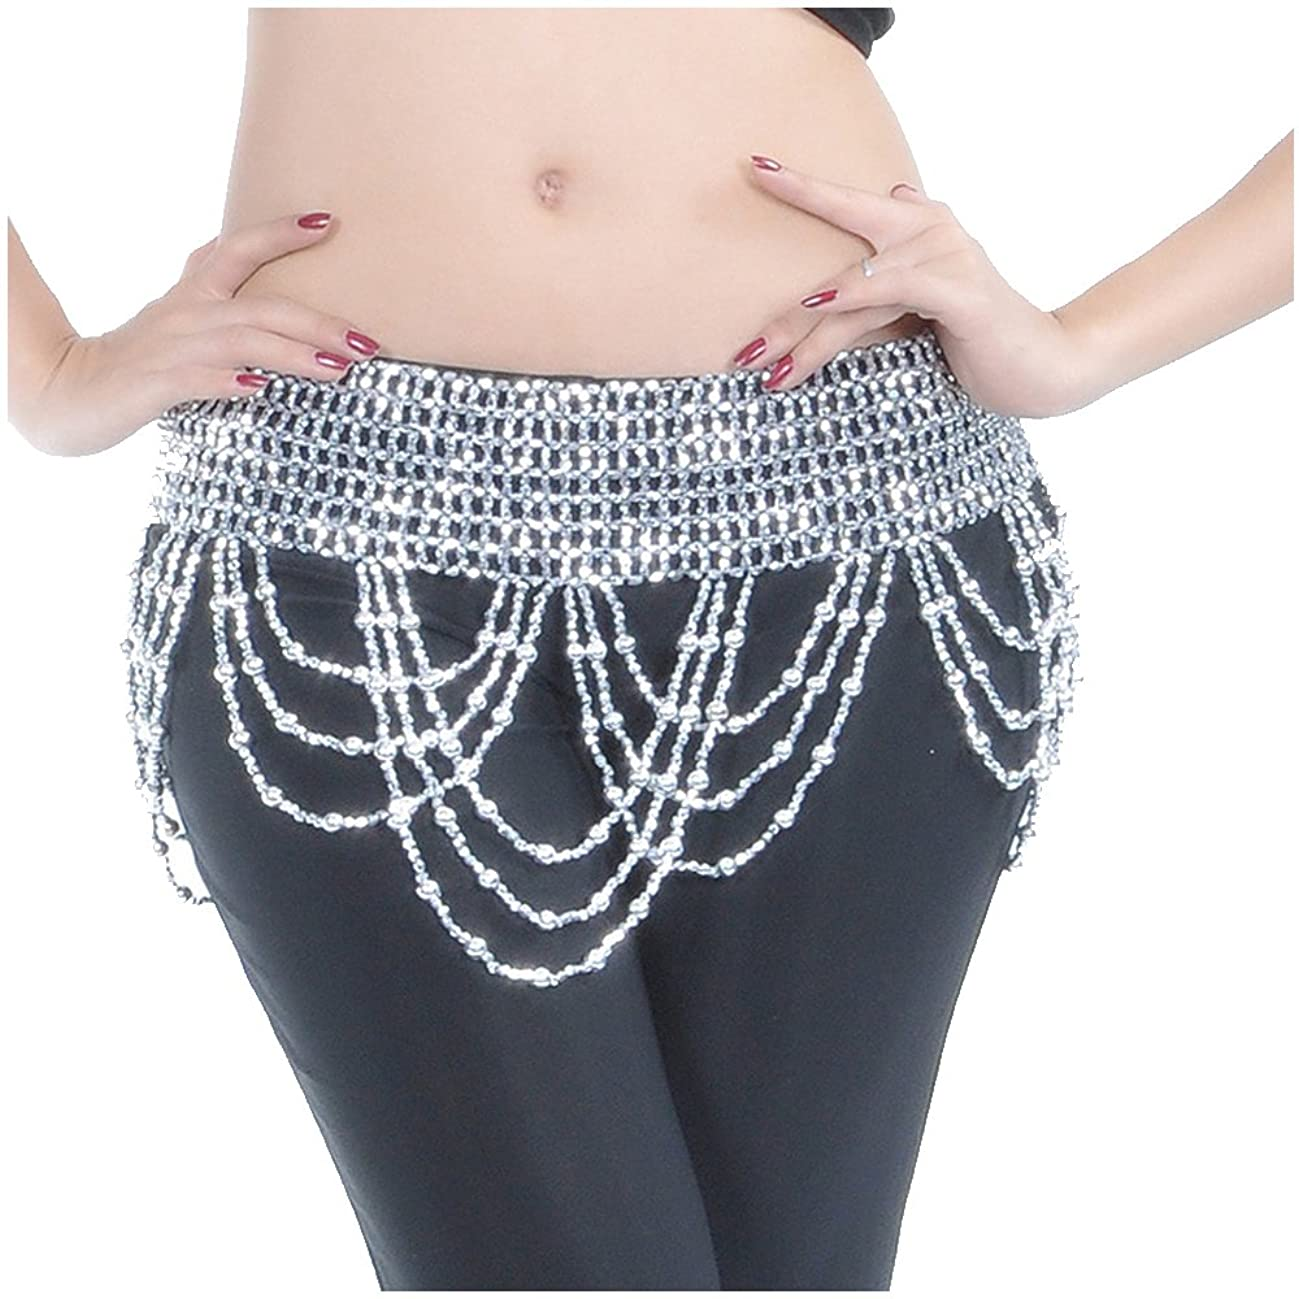 Backgarden Performance Tribal Belly Dance Hip Scarf Waist Body Jewelry Shiny Beaded Coins Belt